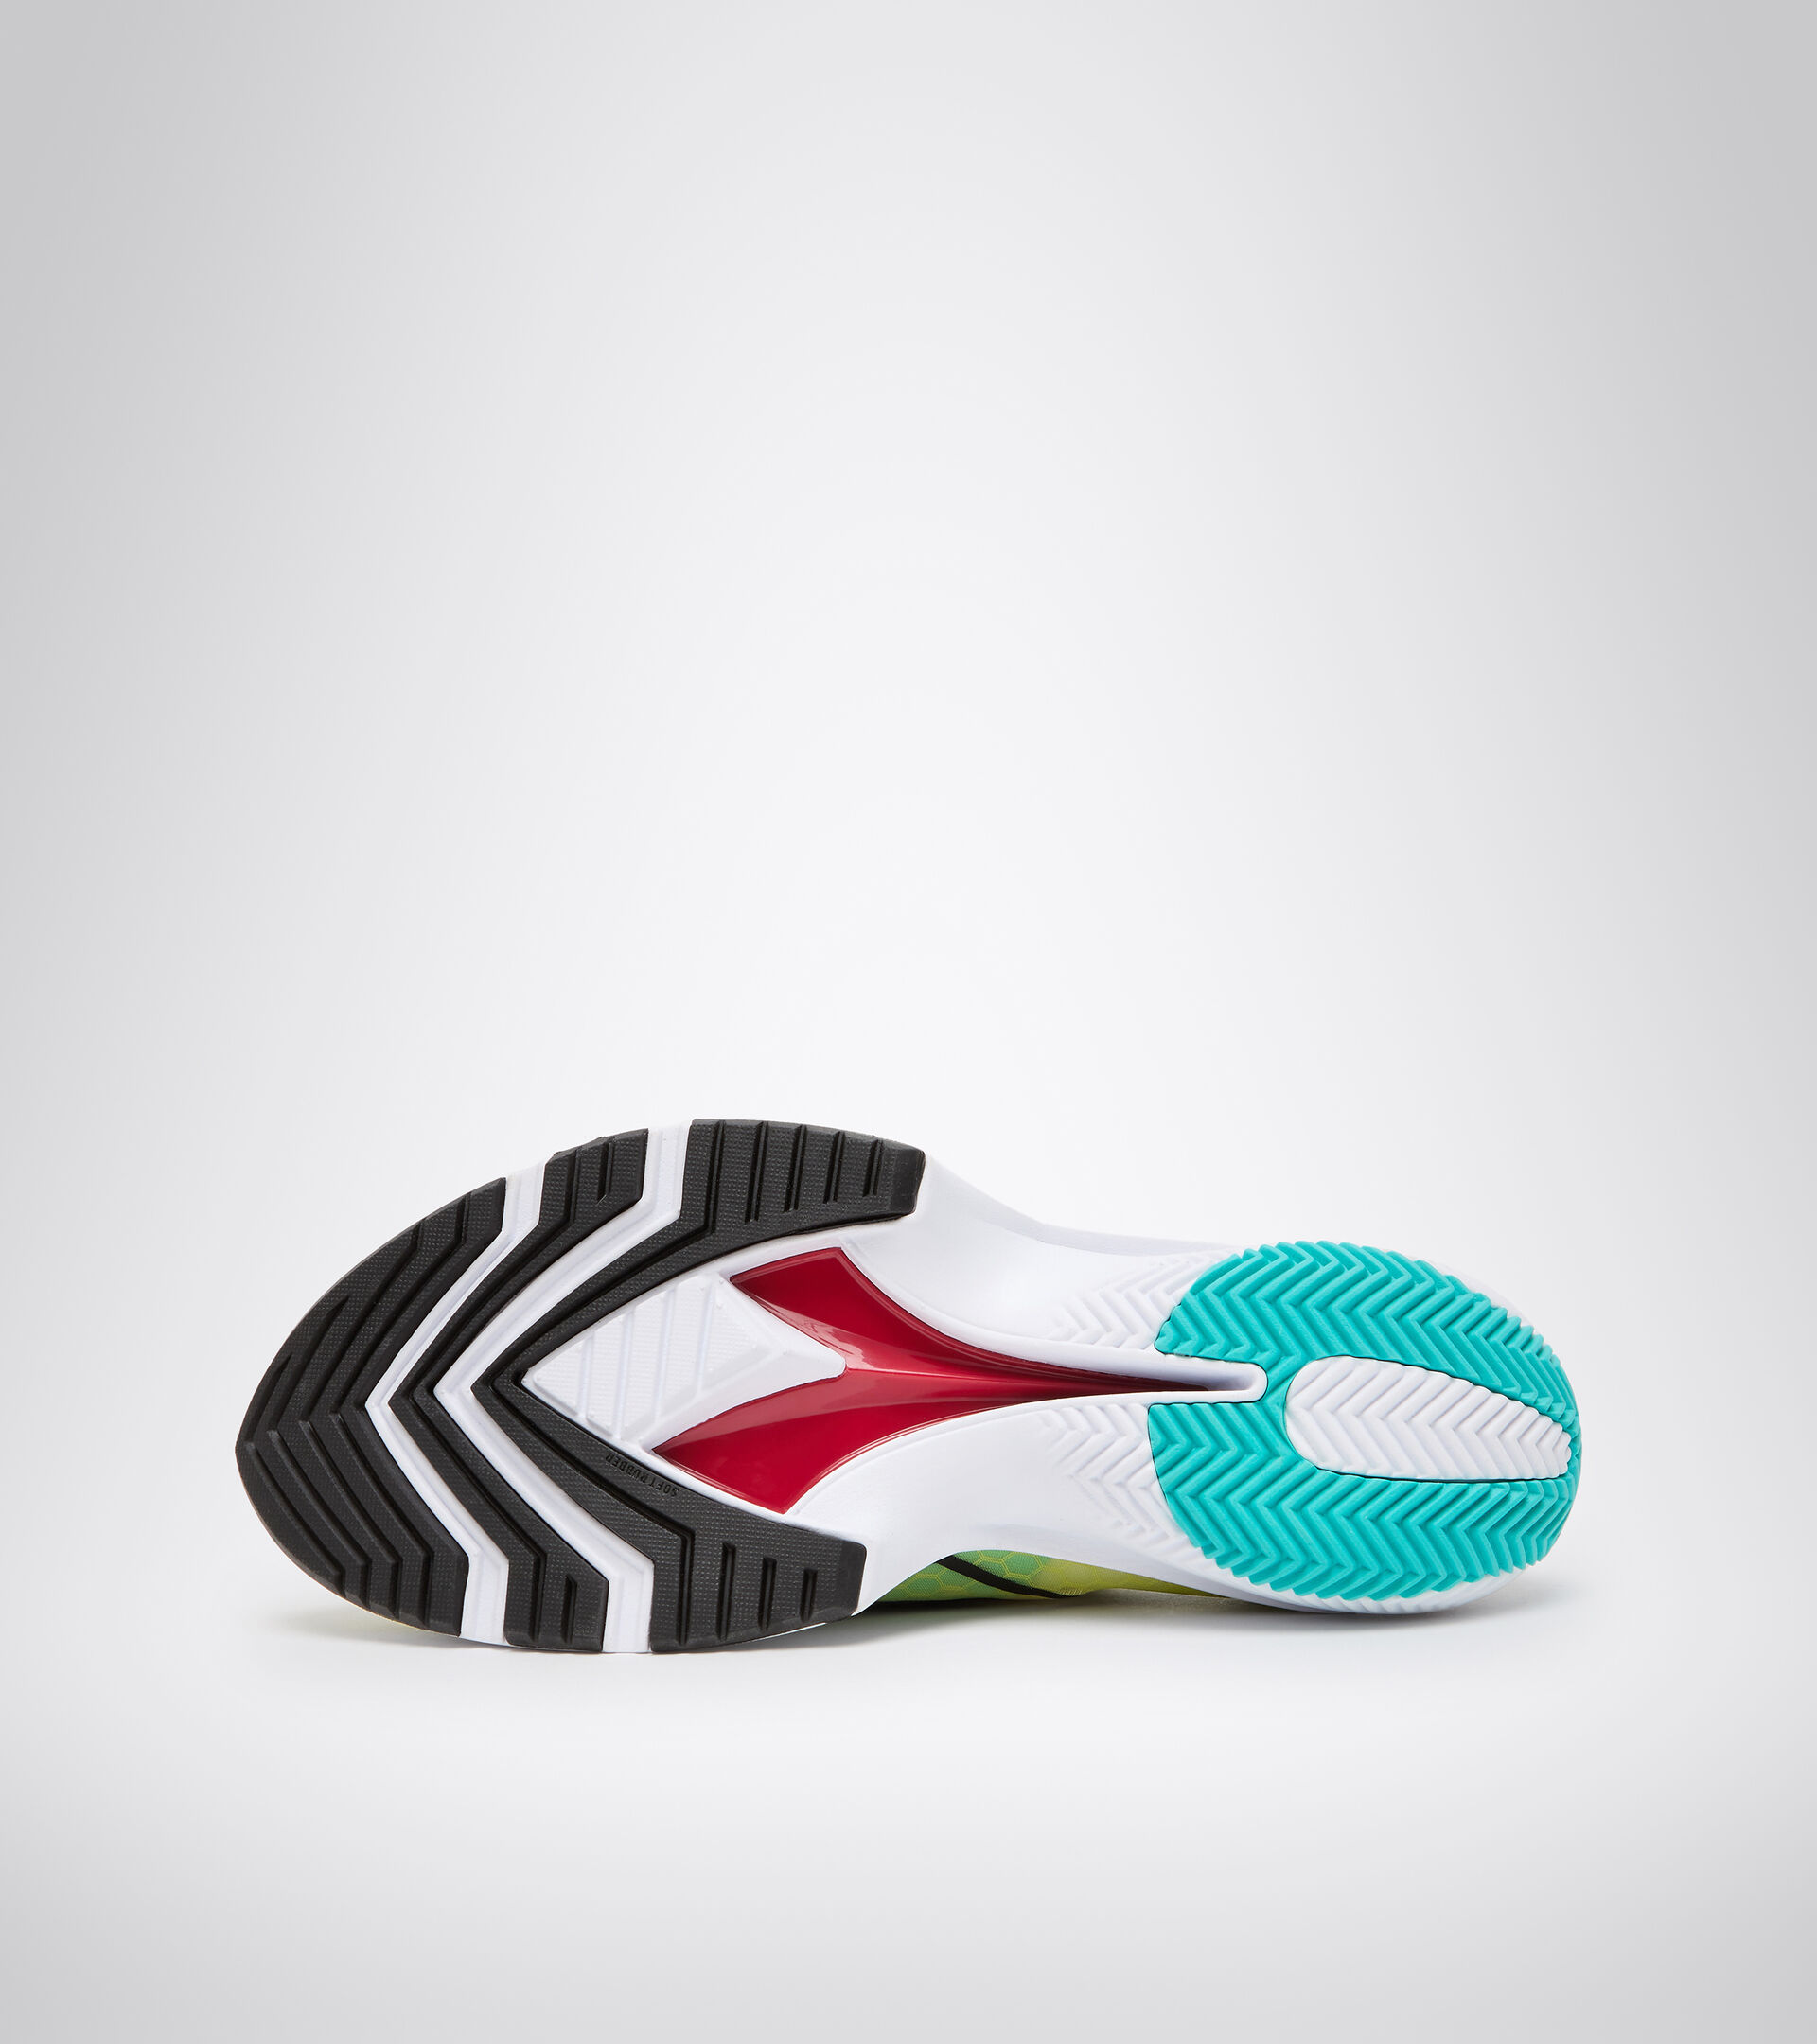 Footwear Sport UNISEX EQUIPE CORSA MANANTIALES DE SULFURO/NRG/BLC Diadora